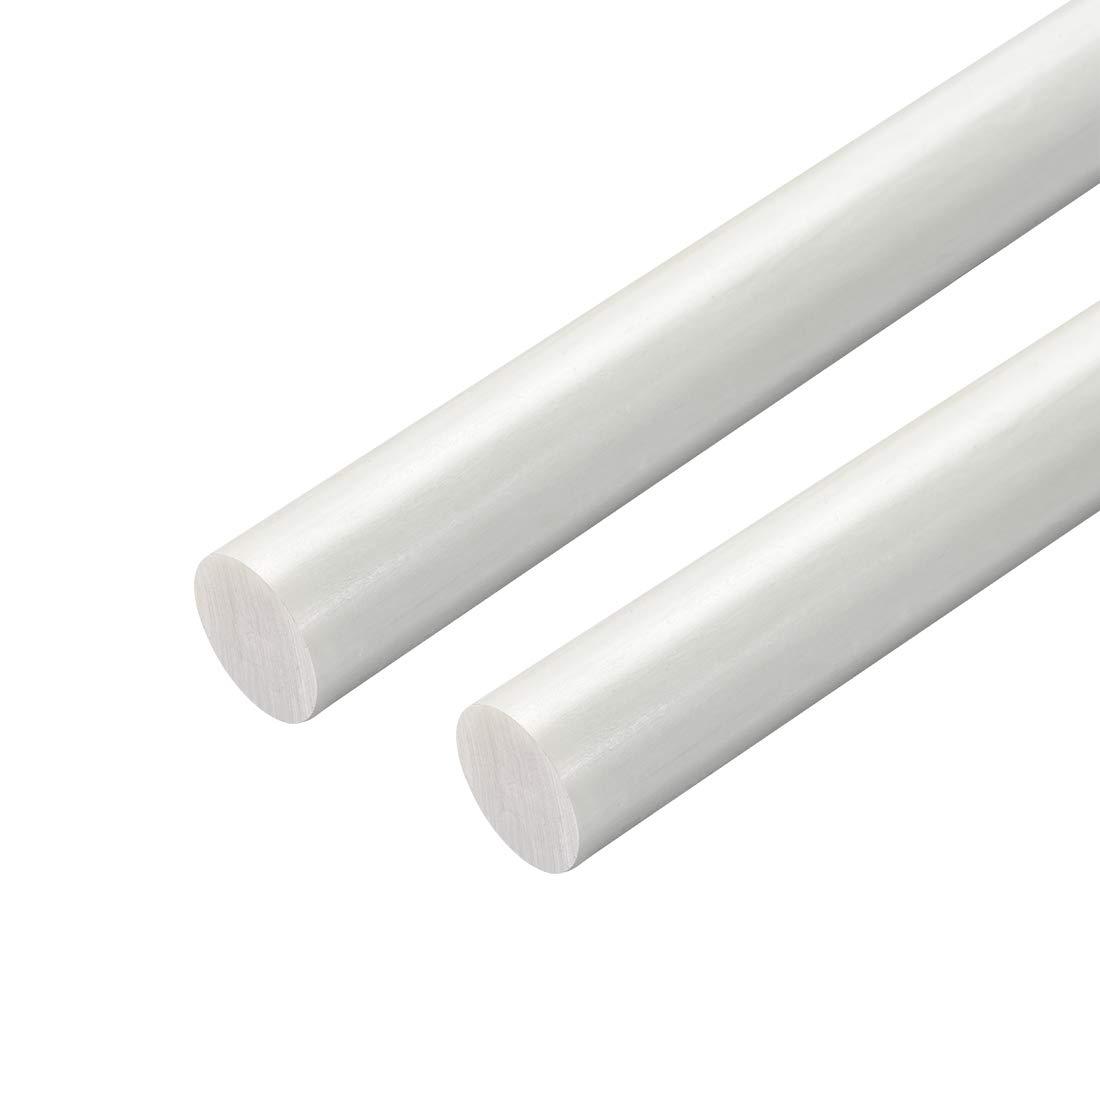 uxcell Plastic Round Rod,5//8 inch Dia 20 inch Length,White FRP Fiberglass Round Rod Engineering Plastic Bar 2pcs